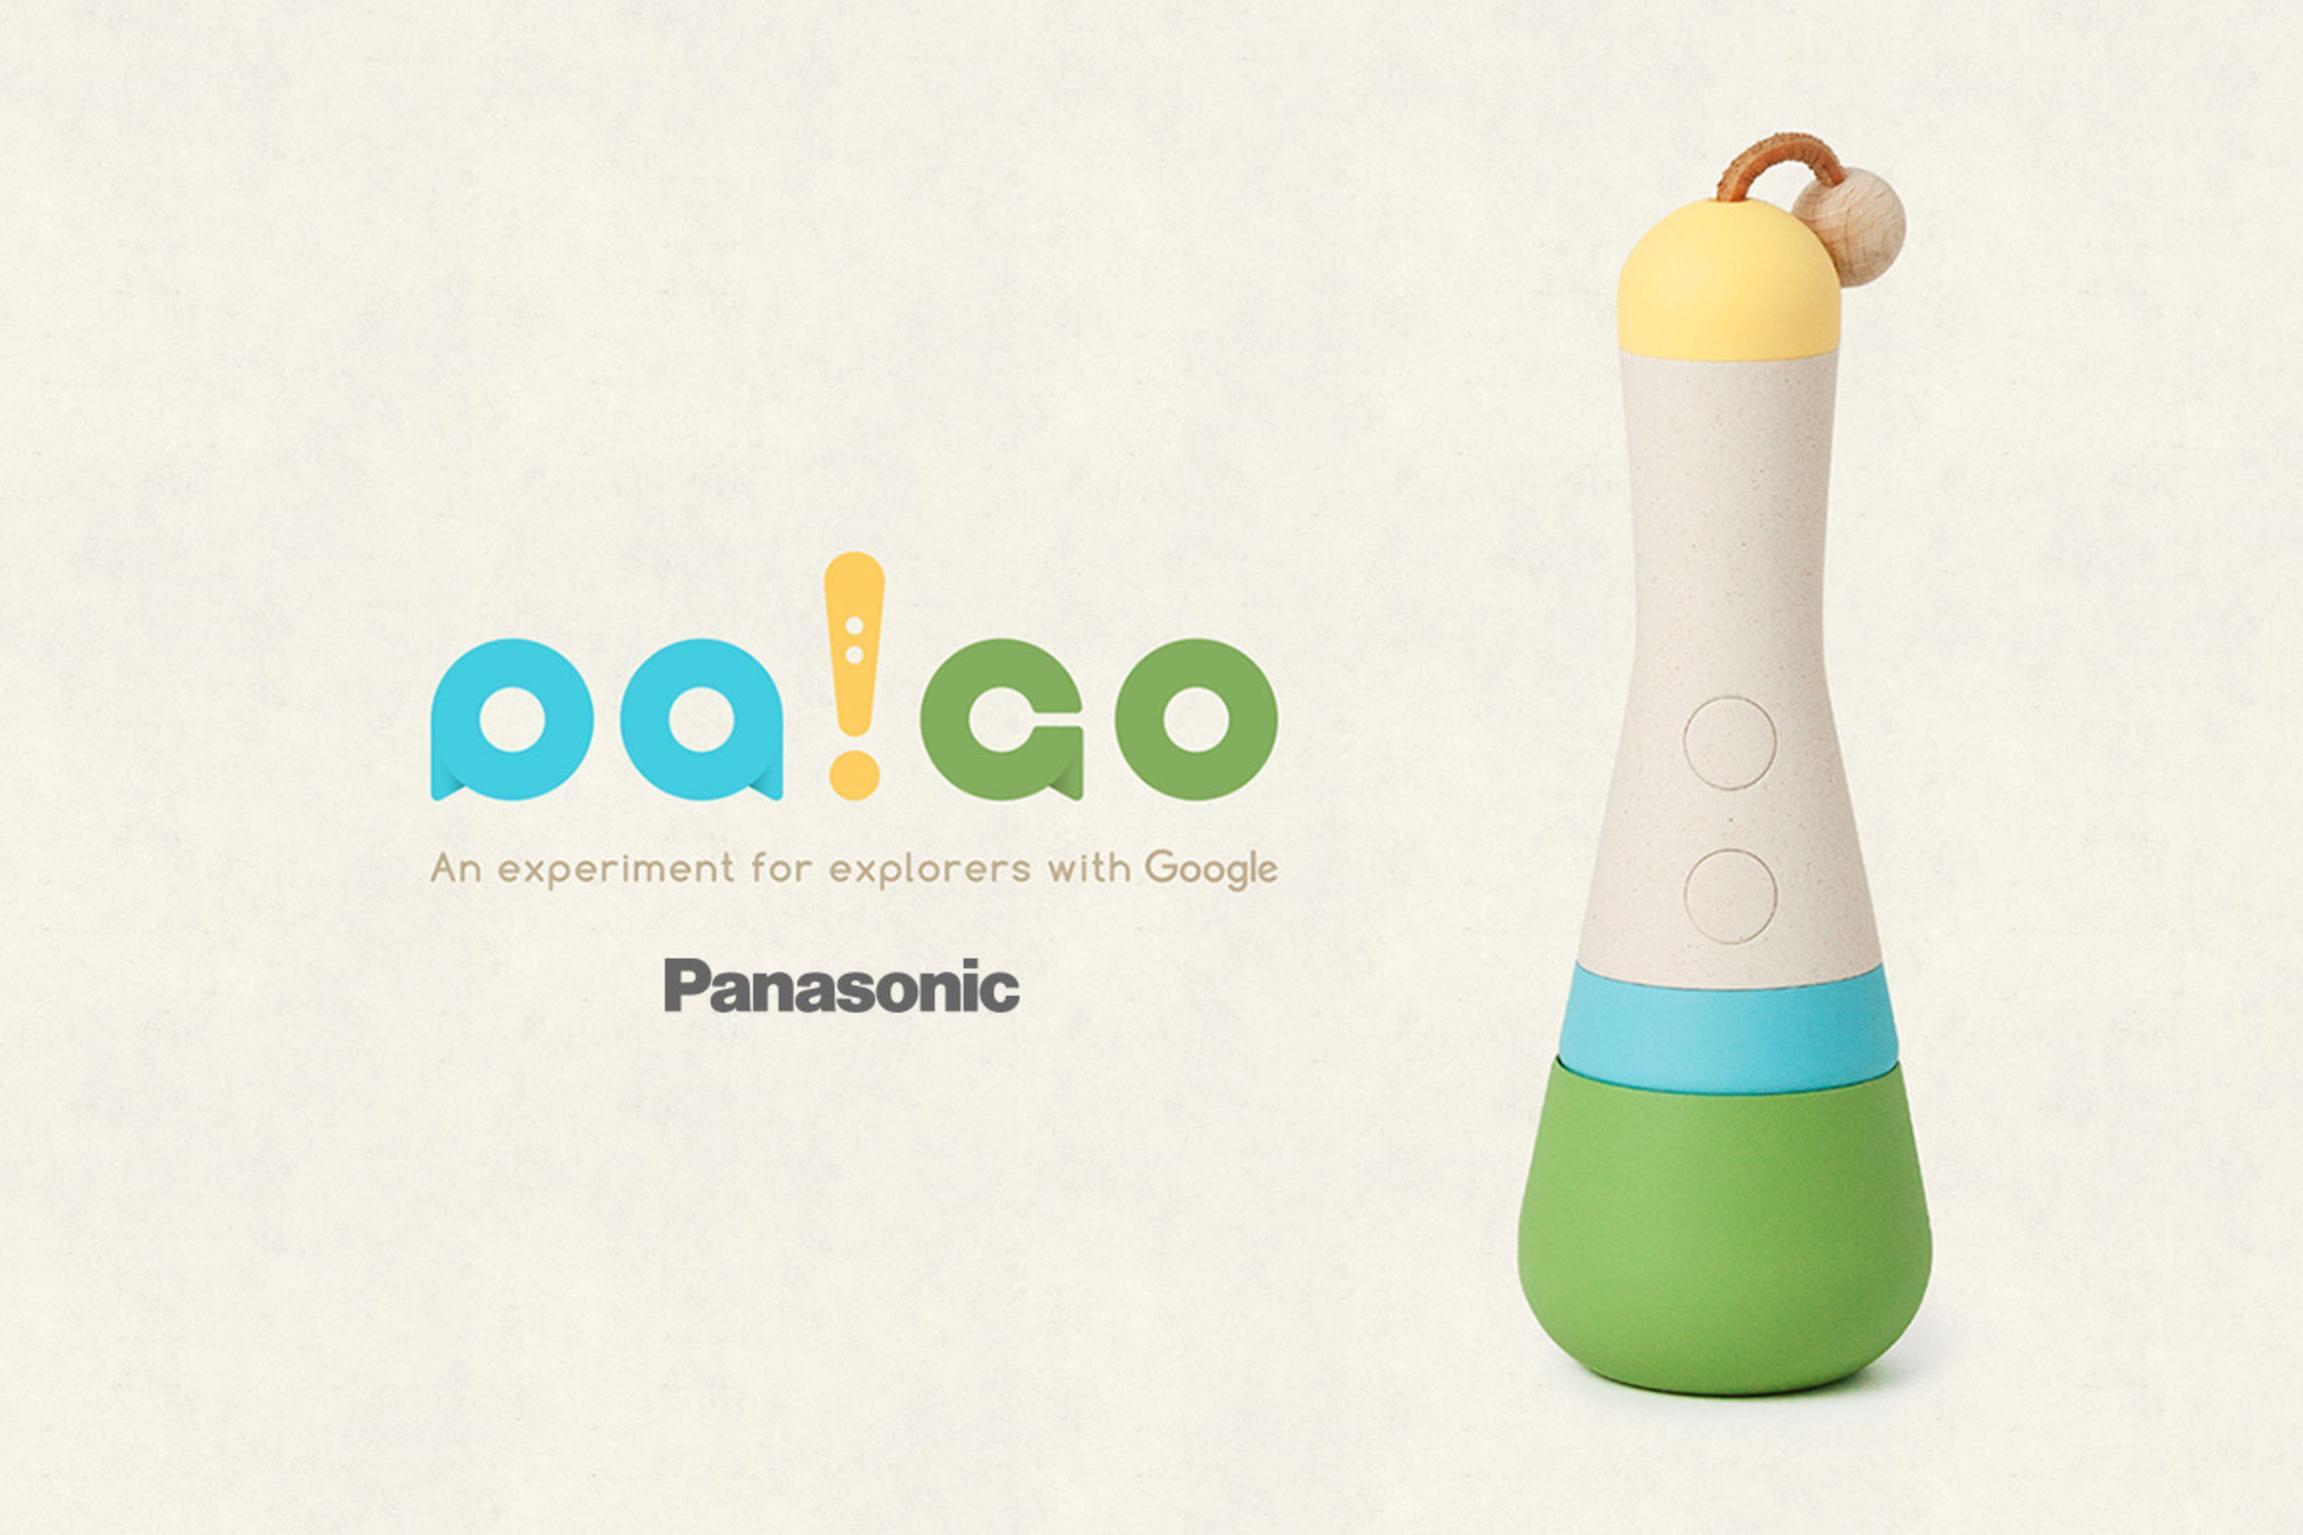 Image: PA!GO